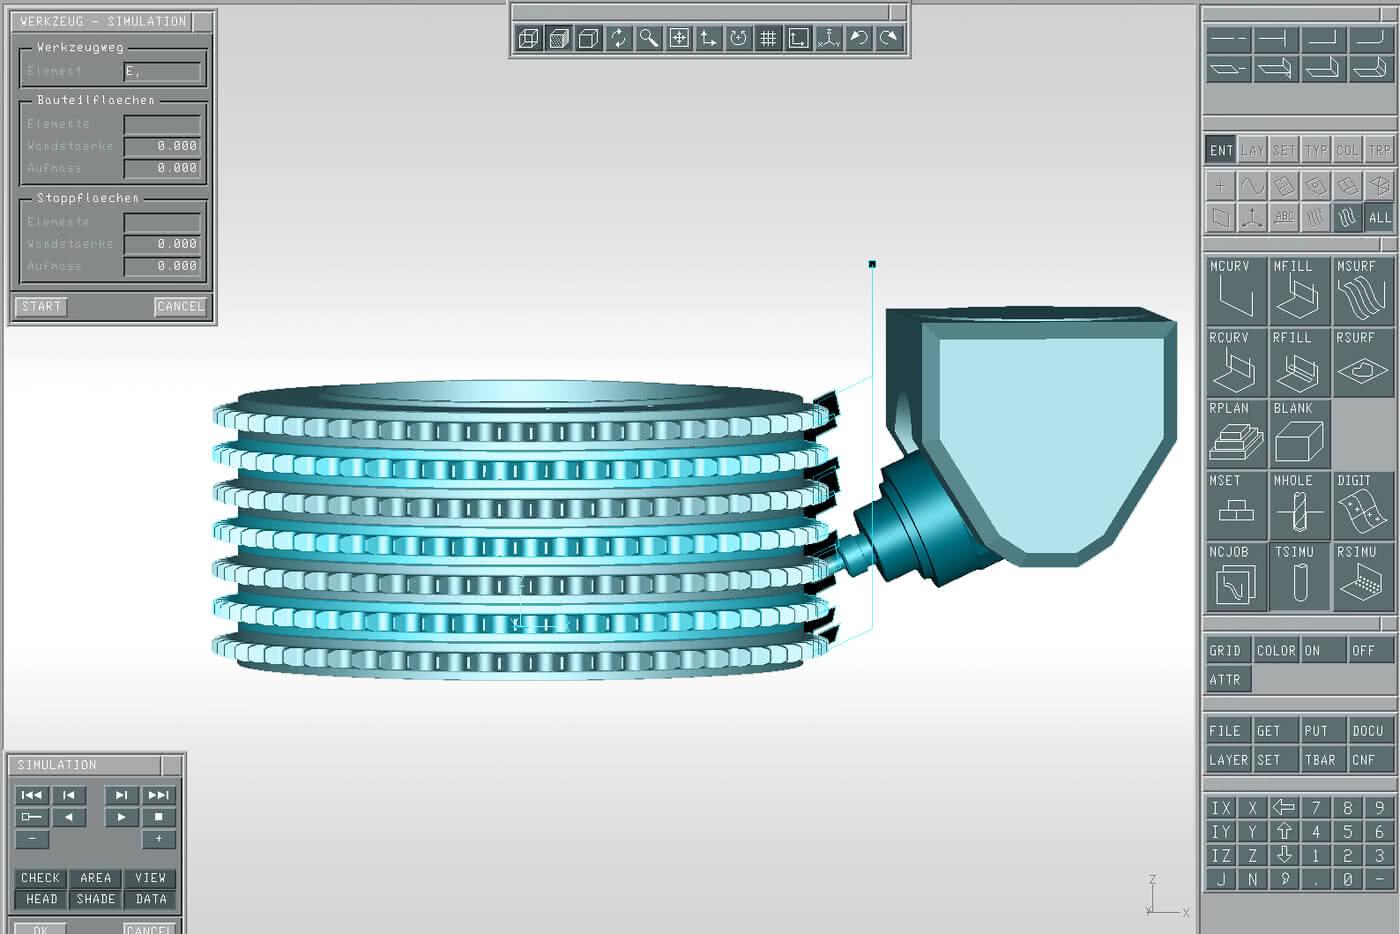 Laro NC virtuelle Maschine3b.jpg